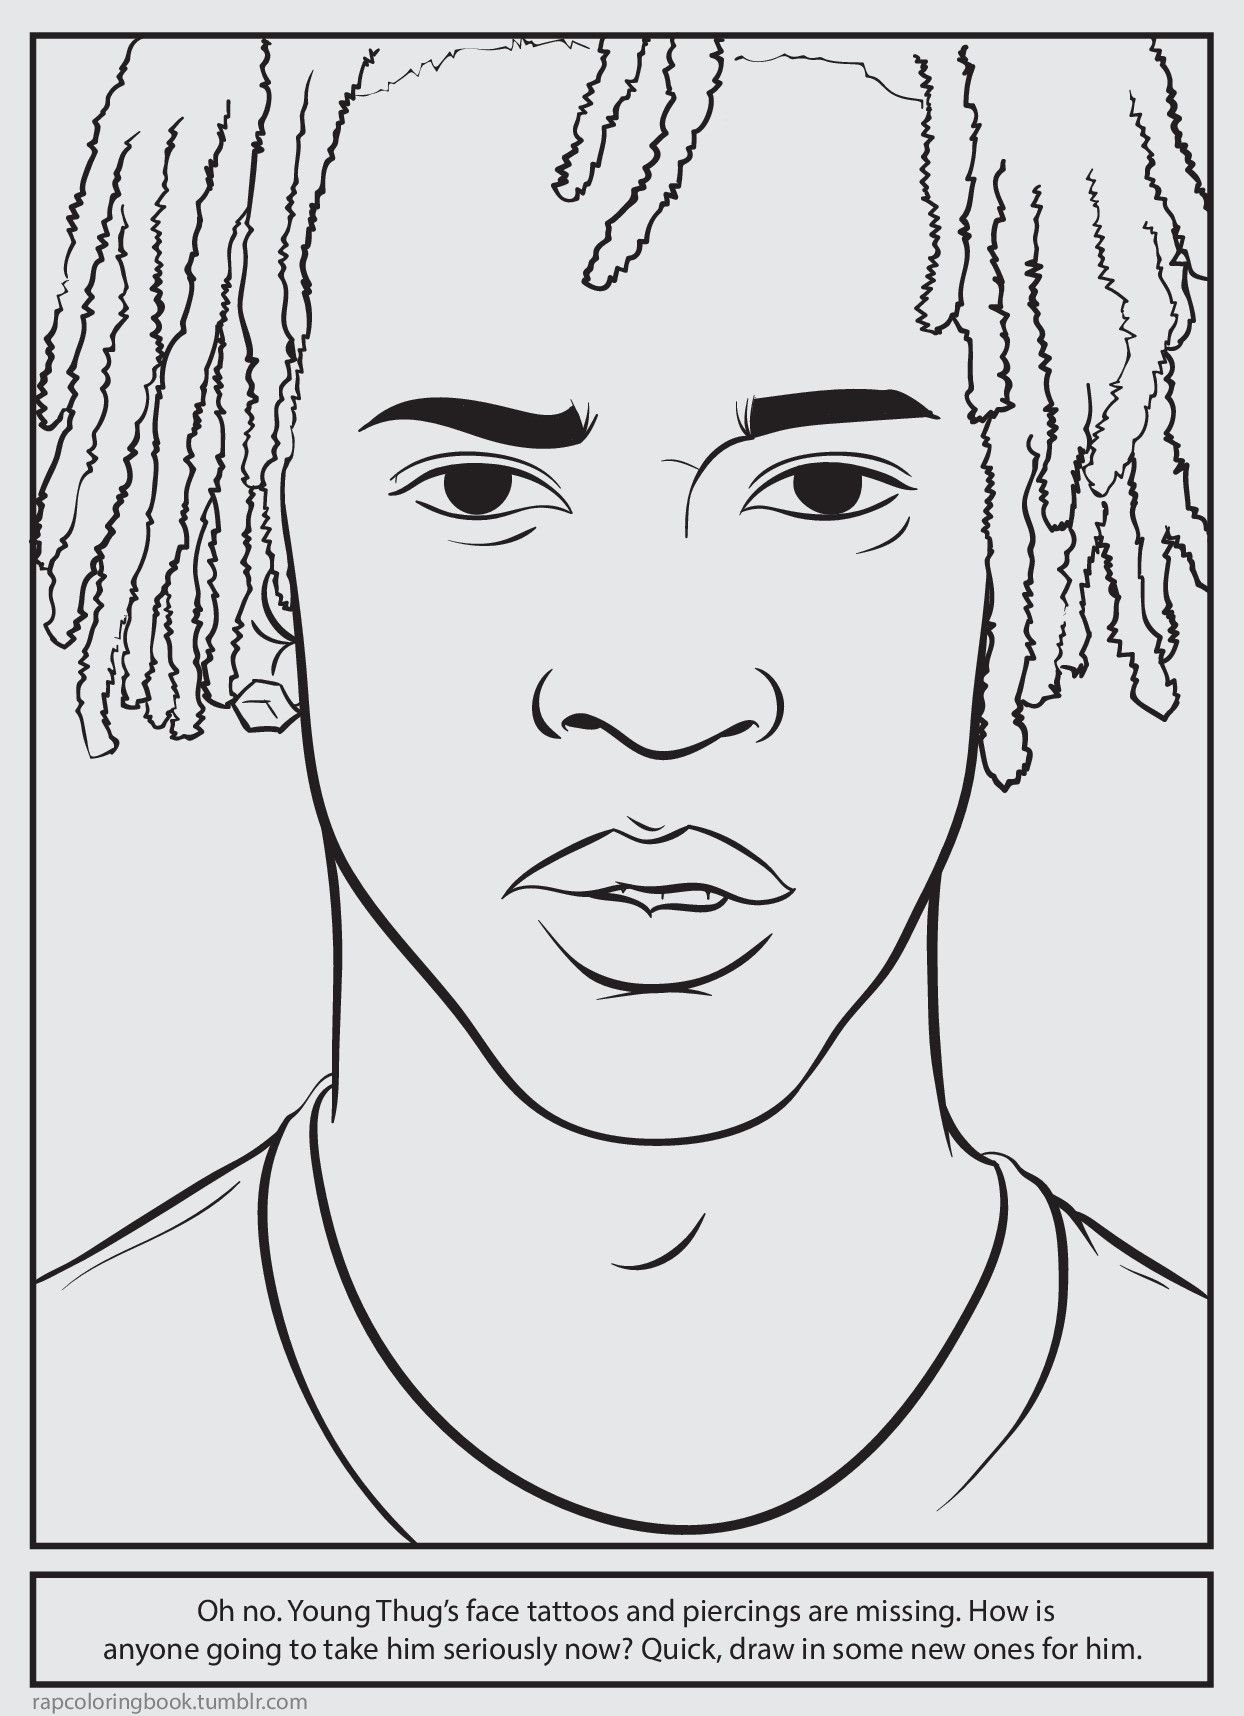 Bun B\'s Jumbo Coloring And Rap Activity Tumblr | Young Thug is so ...